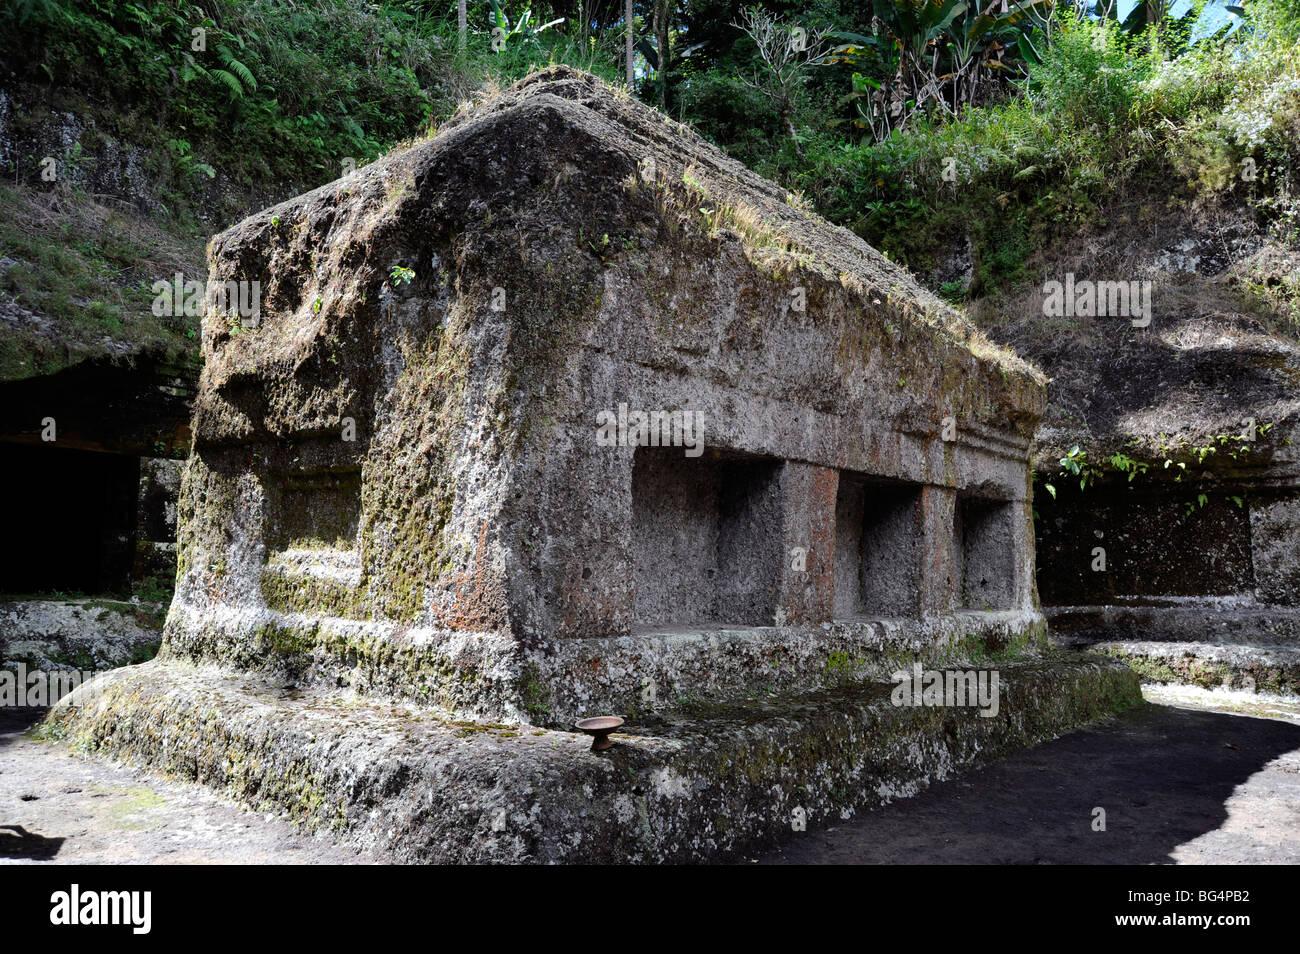 Hermitage Buddhist and Hinduist in Gunung Kawi Temples, Tampaksiring, Bali, Indonesia - Stock Image